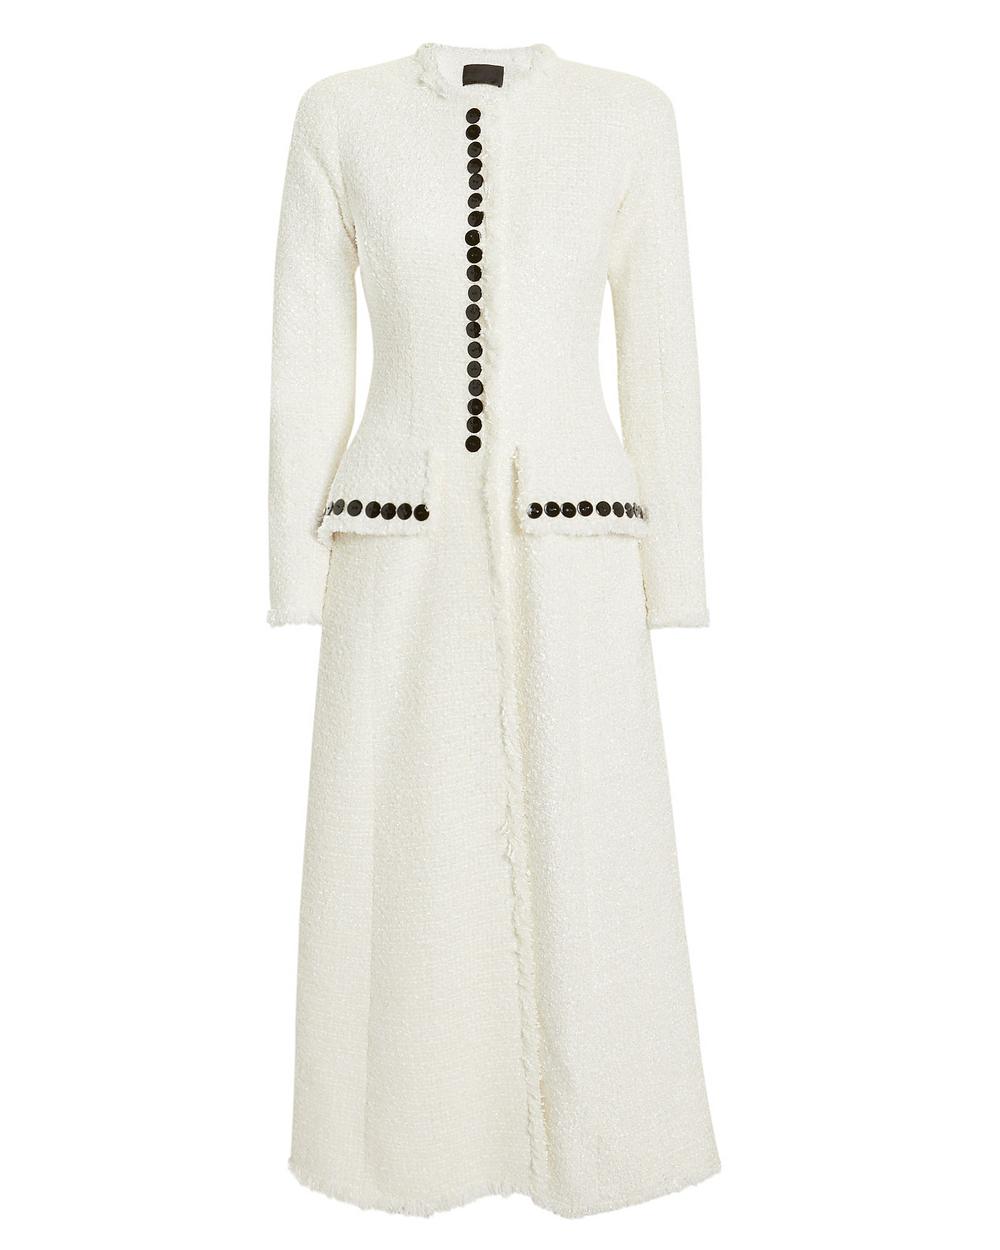 Tailored Coat - Alexander Wang Tweed Coat